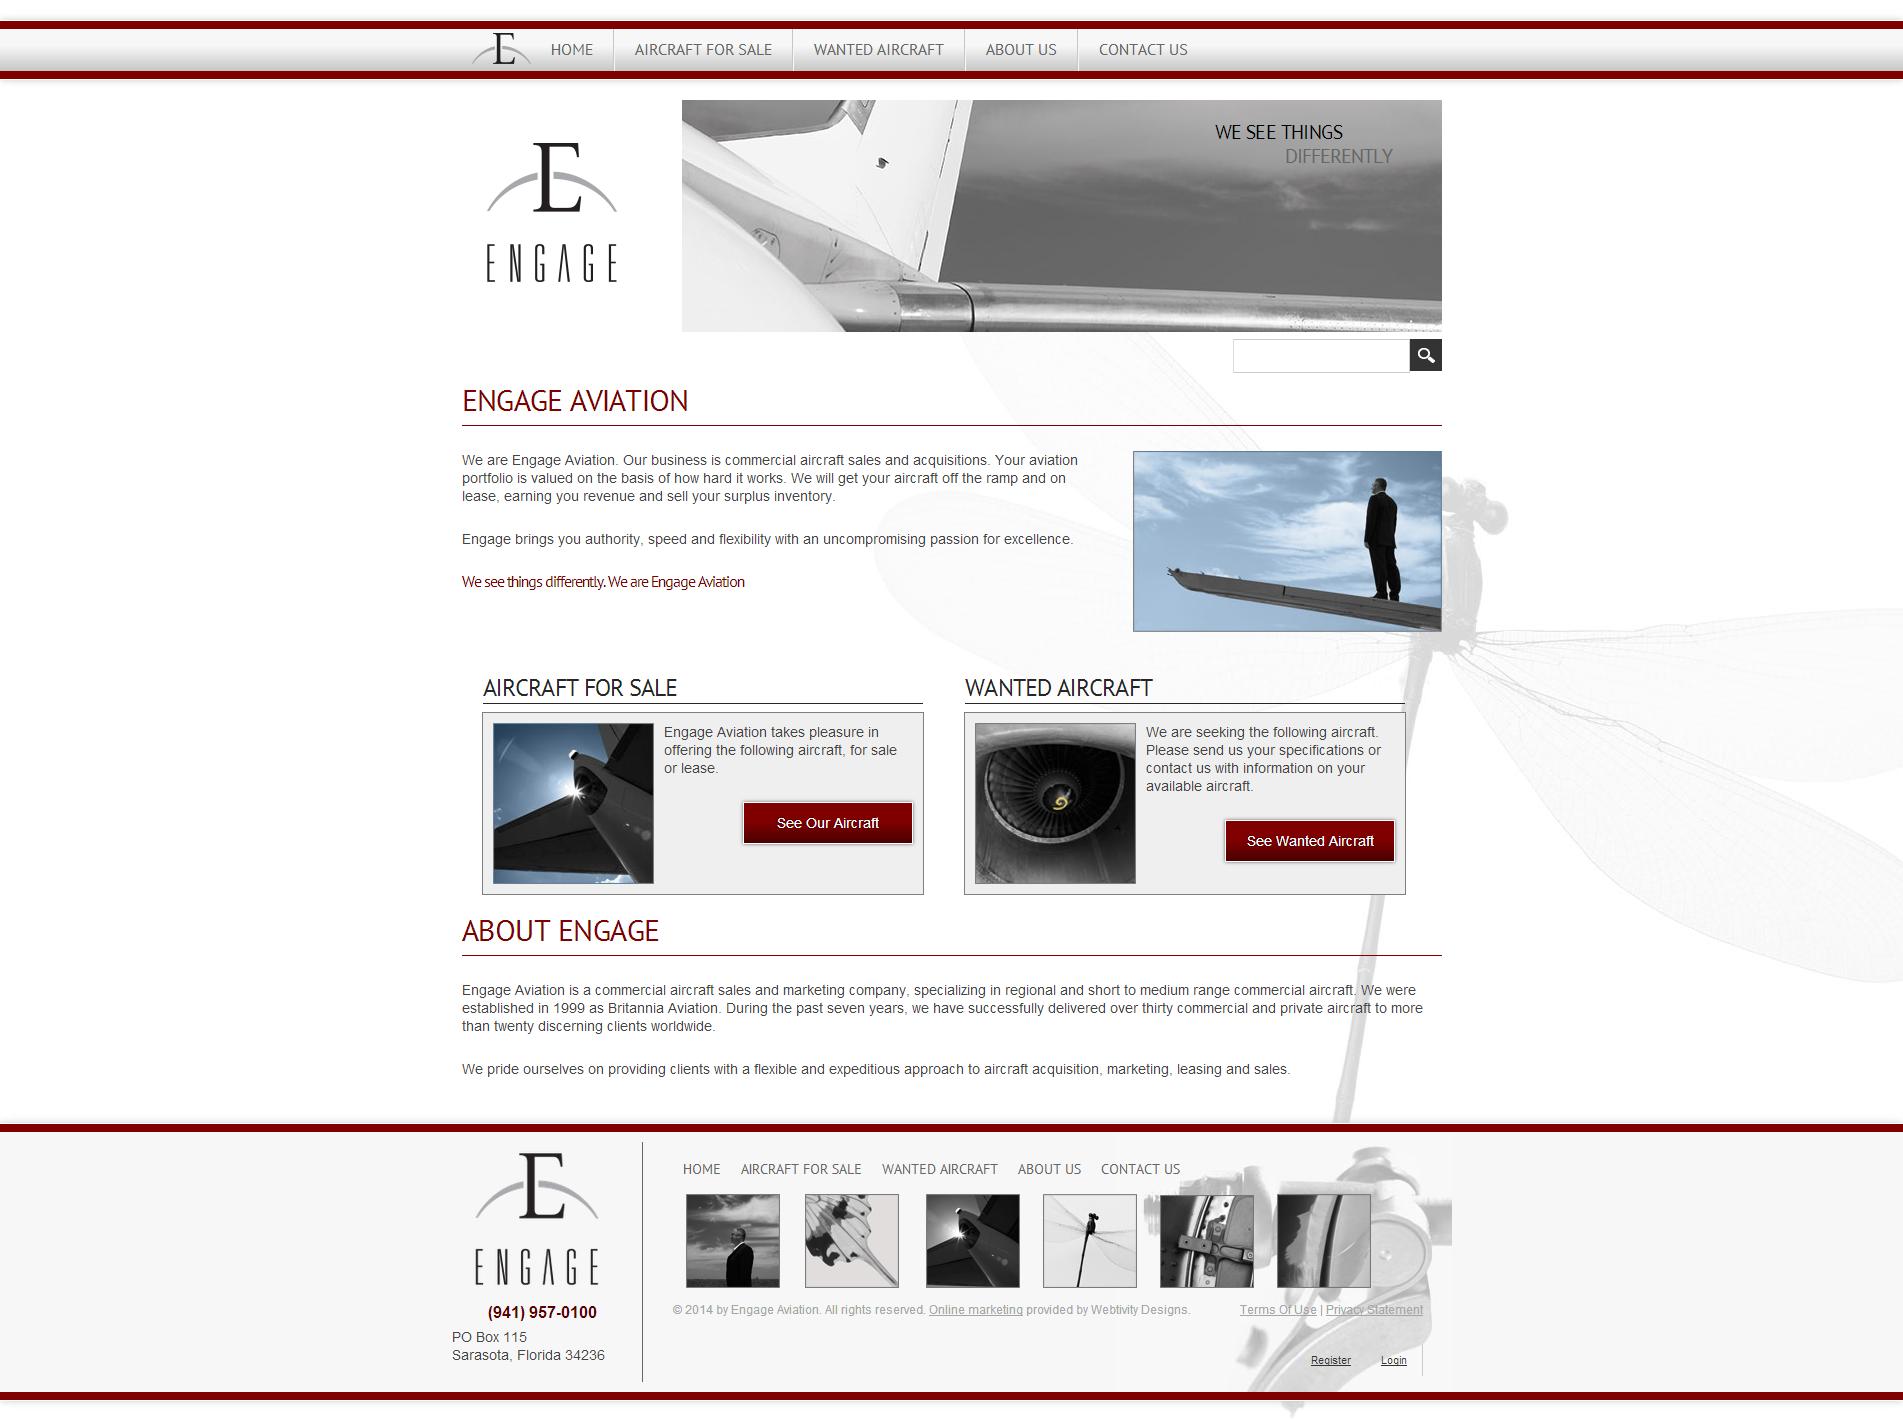 Pin By Webtivity Marketing Design On Webtivity Web Design Portfolio Portfolio Web Design Marketing Design Portfolio Design